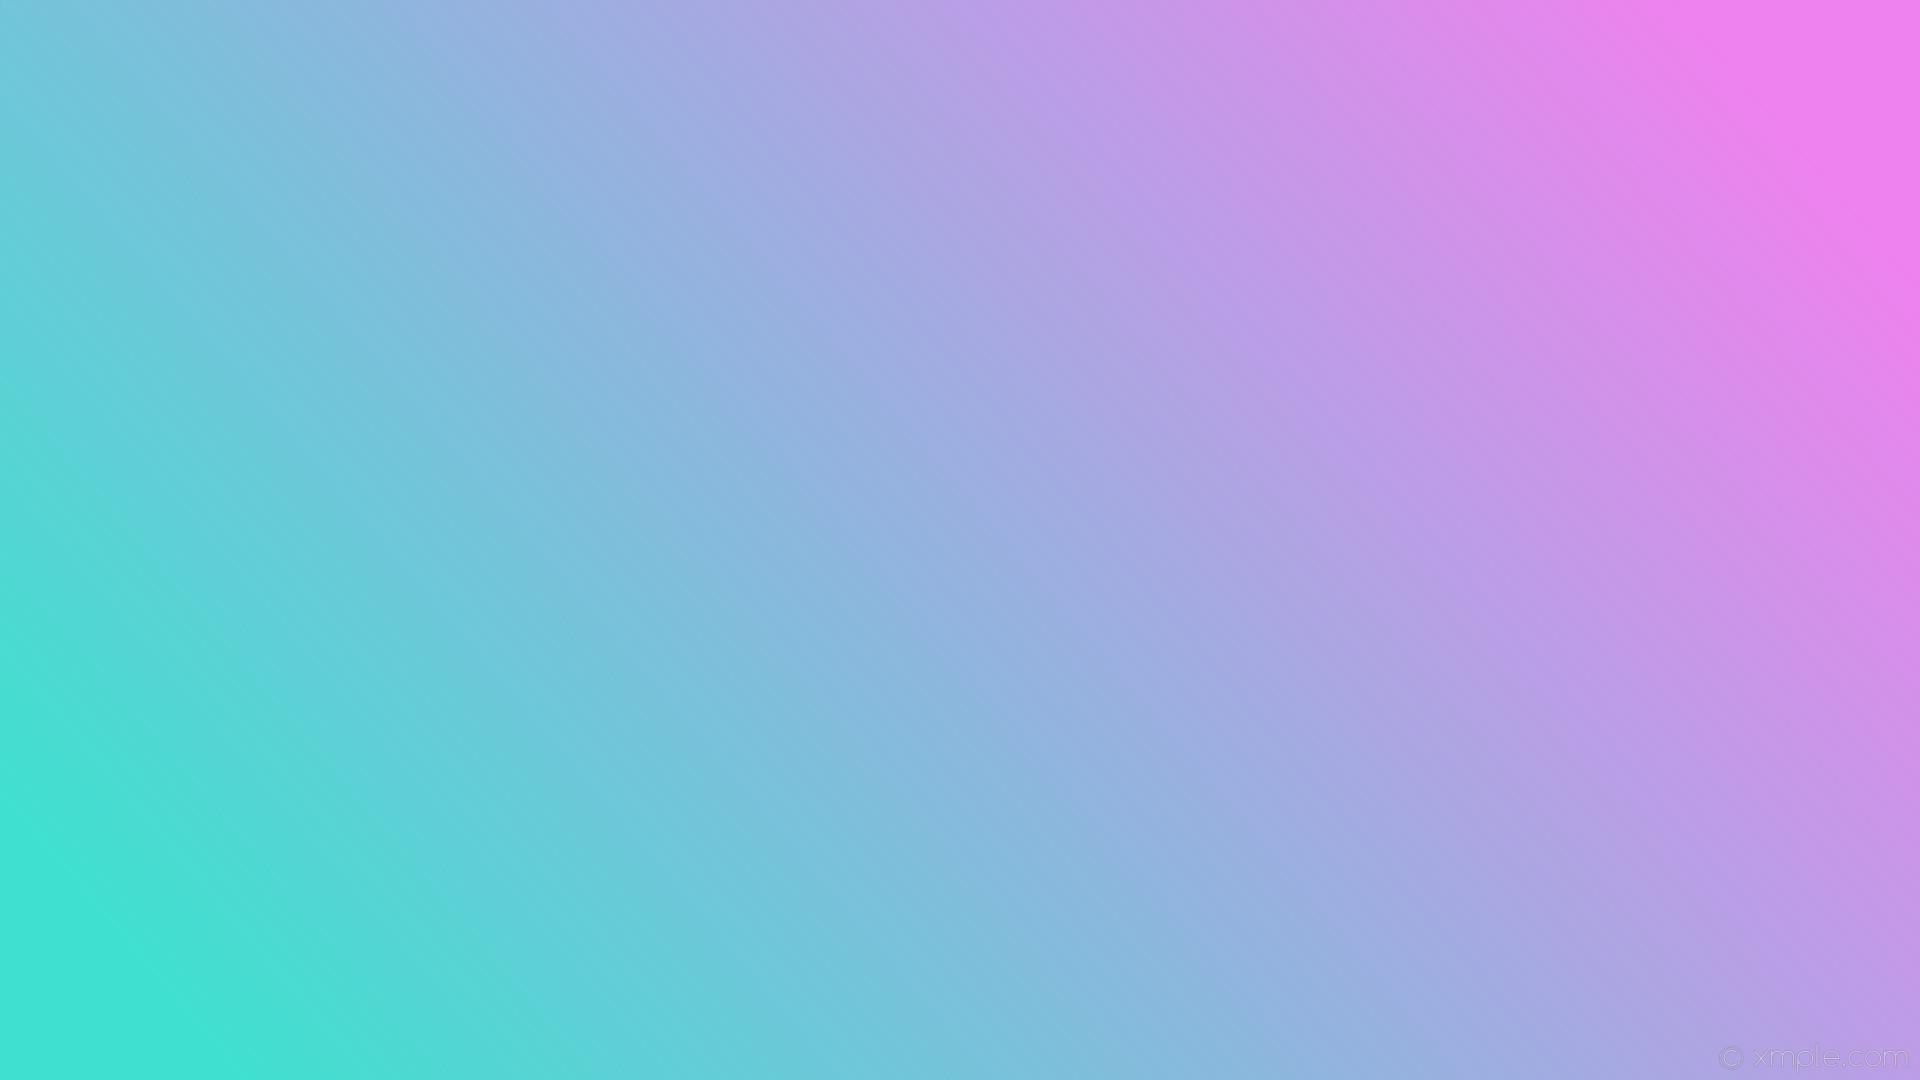 wallpaper blue purple linear gradient violet turquoise #ee82ee #40e0d0 15°